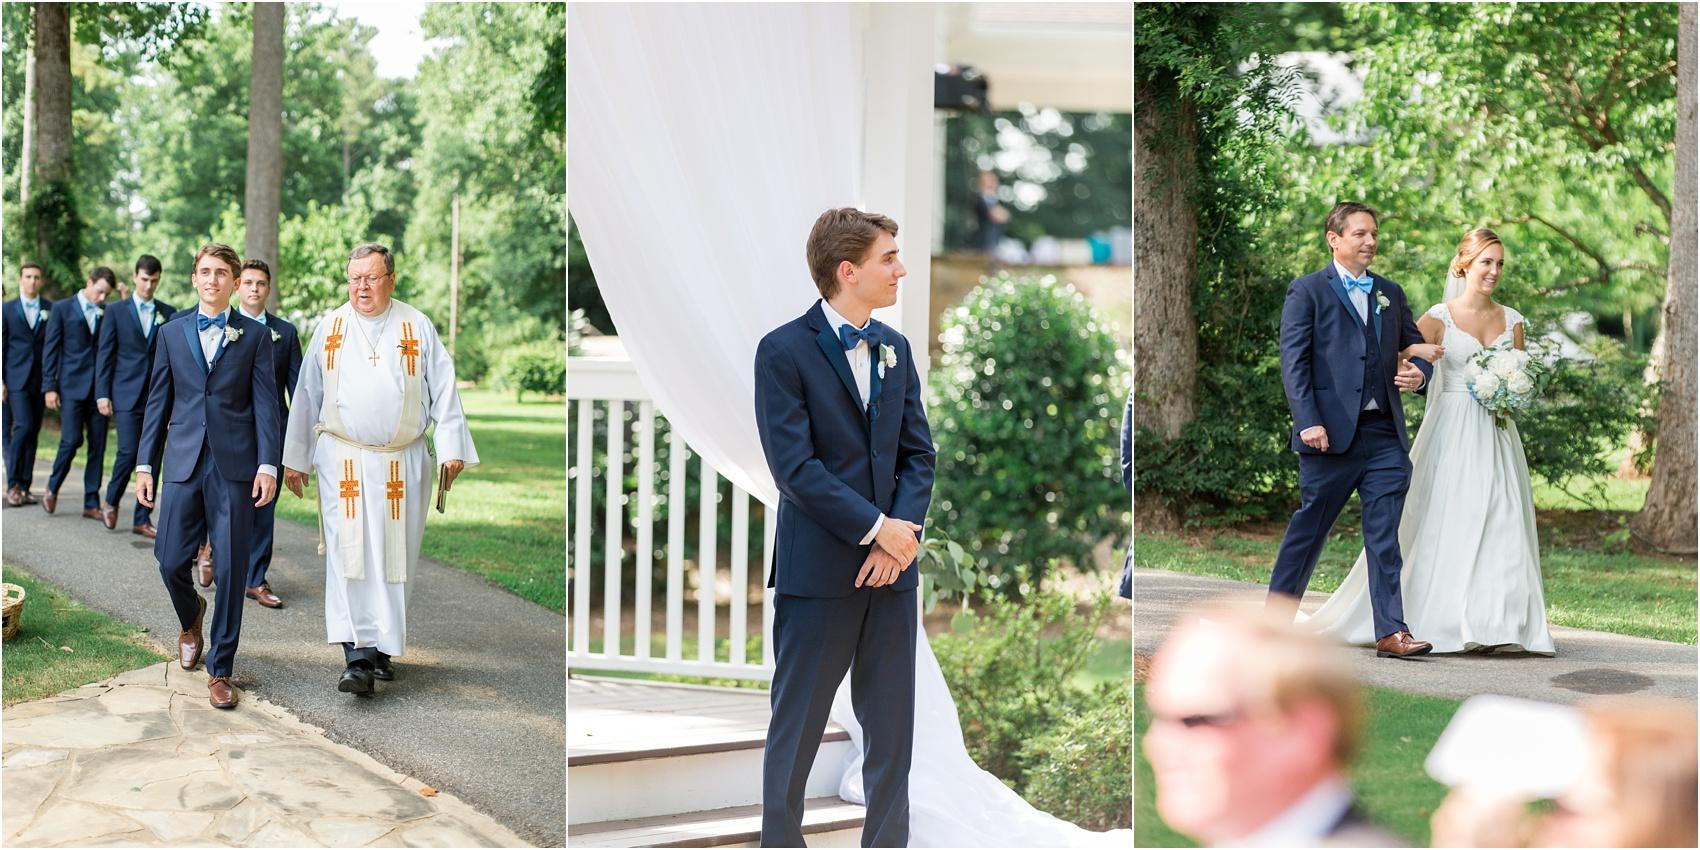 Savannah Eve Photography- Sigl-Adams Wedding- Sneak Peek-30.jpg